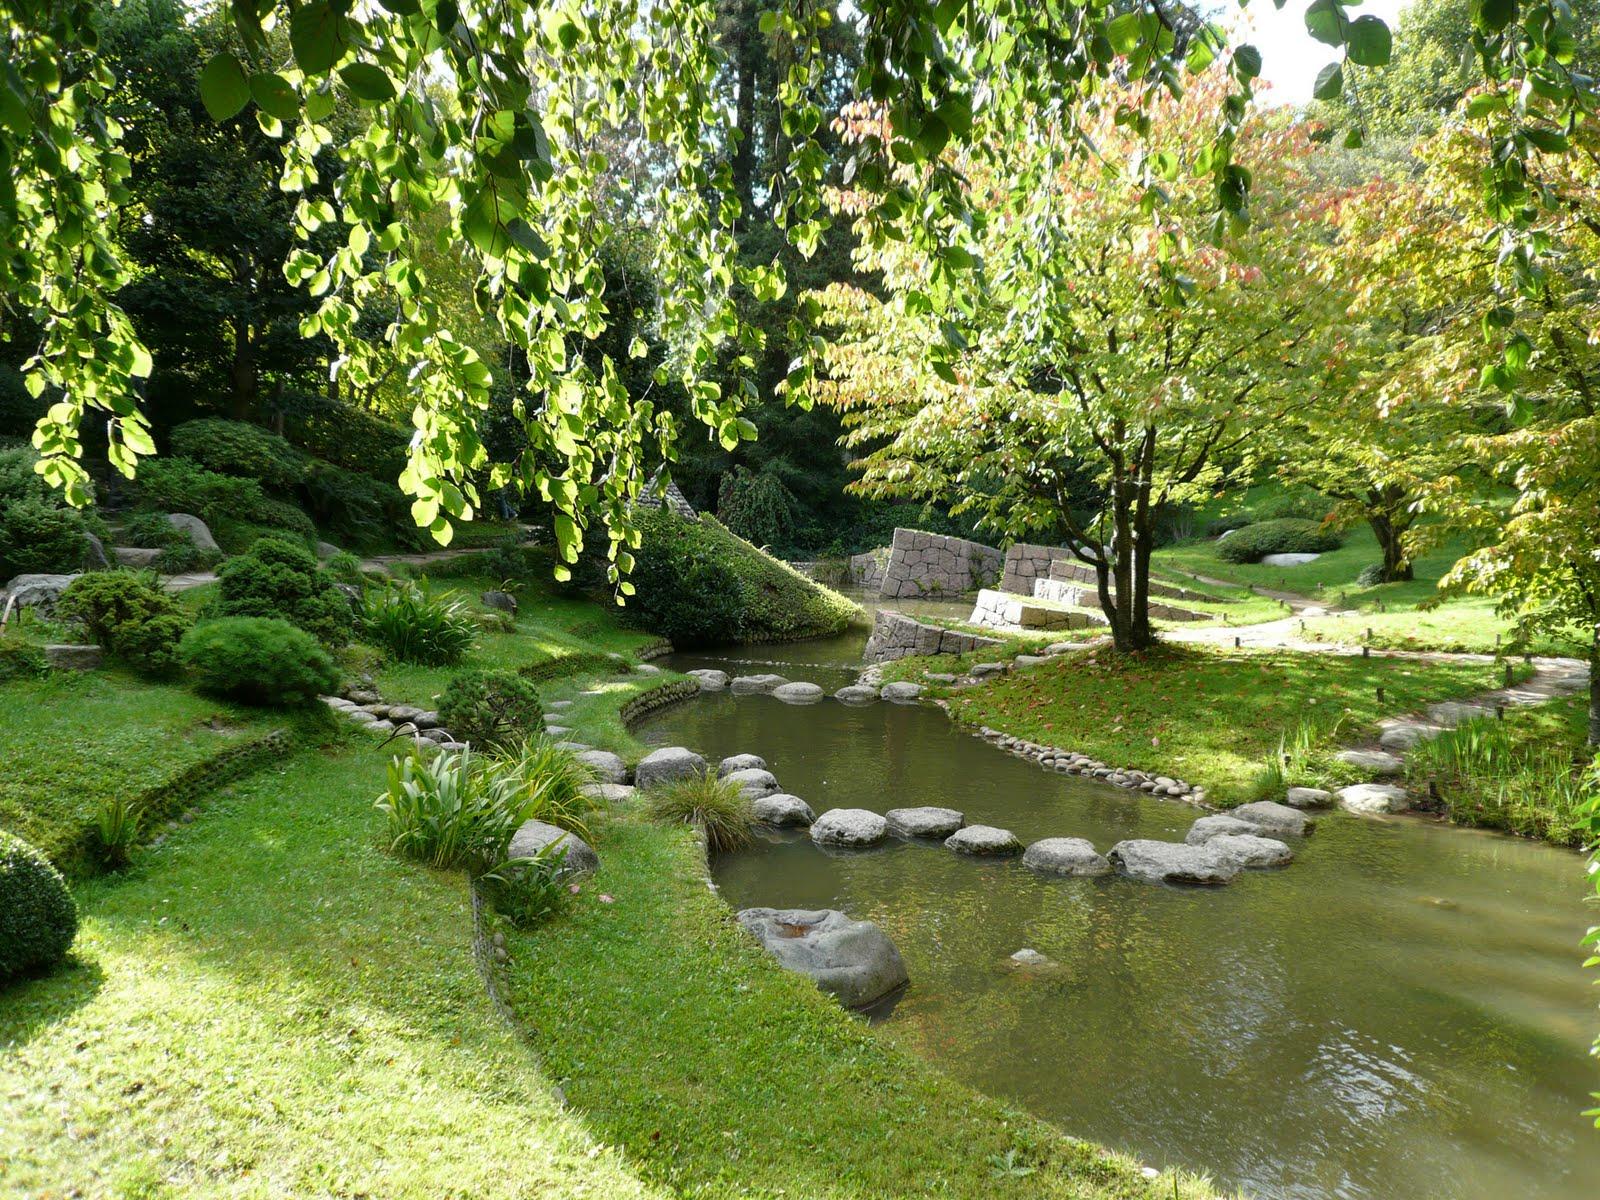 Alice au pays des arts les jardins albert kahn un petit - Les jardins albert kahn ...